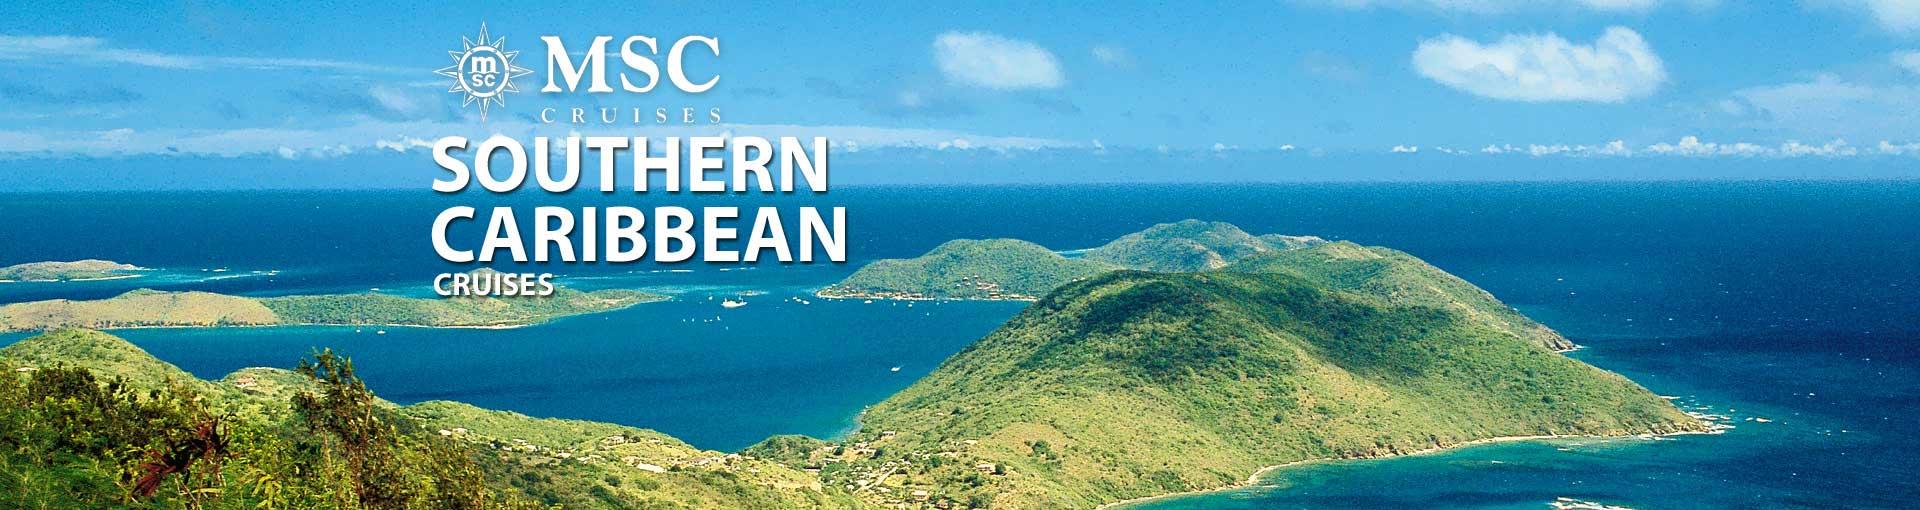 MSC Cruises Southern Caribbean Cruises